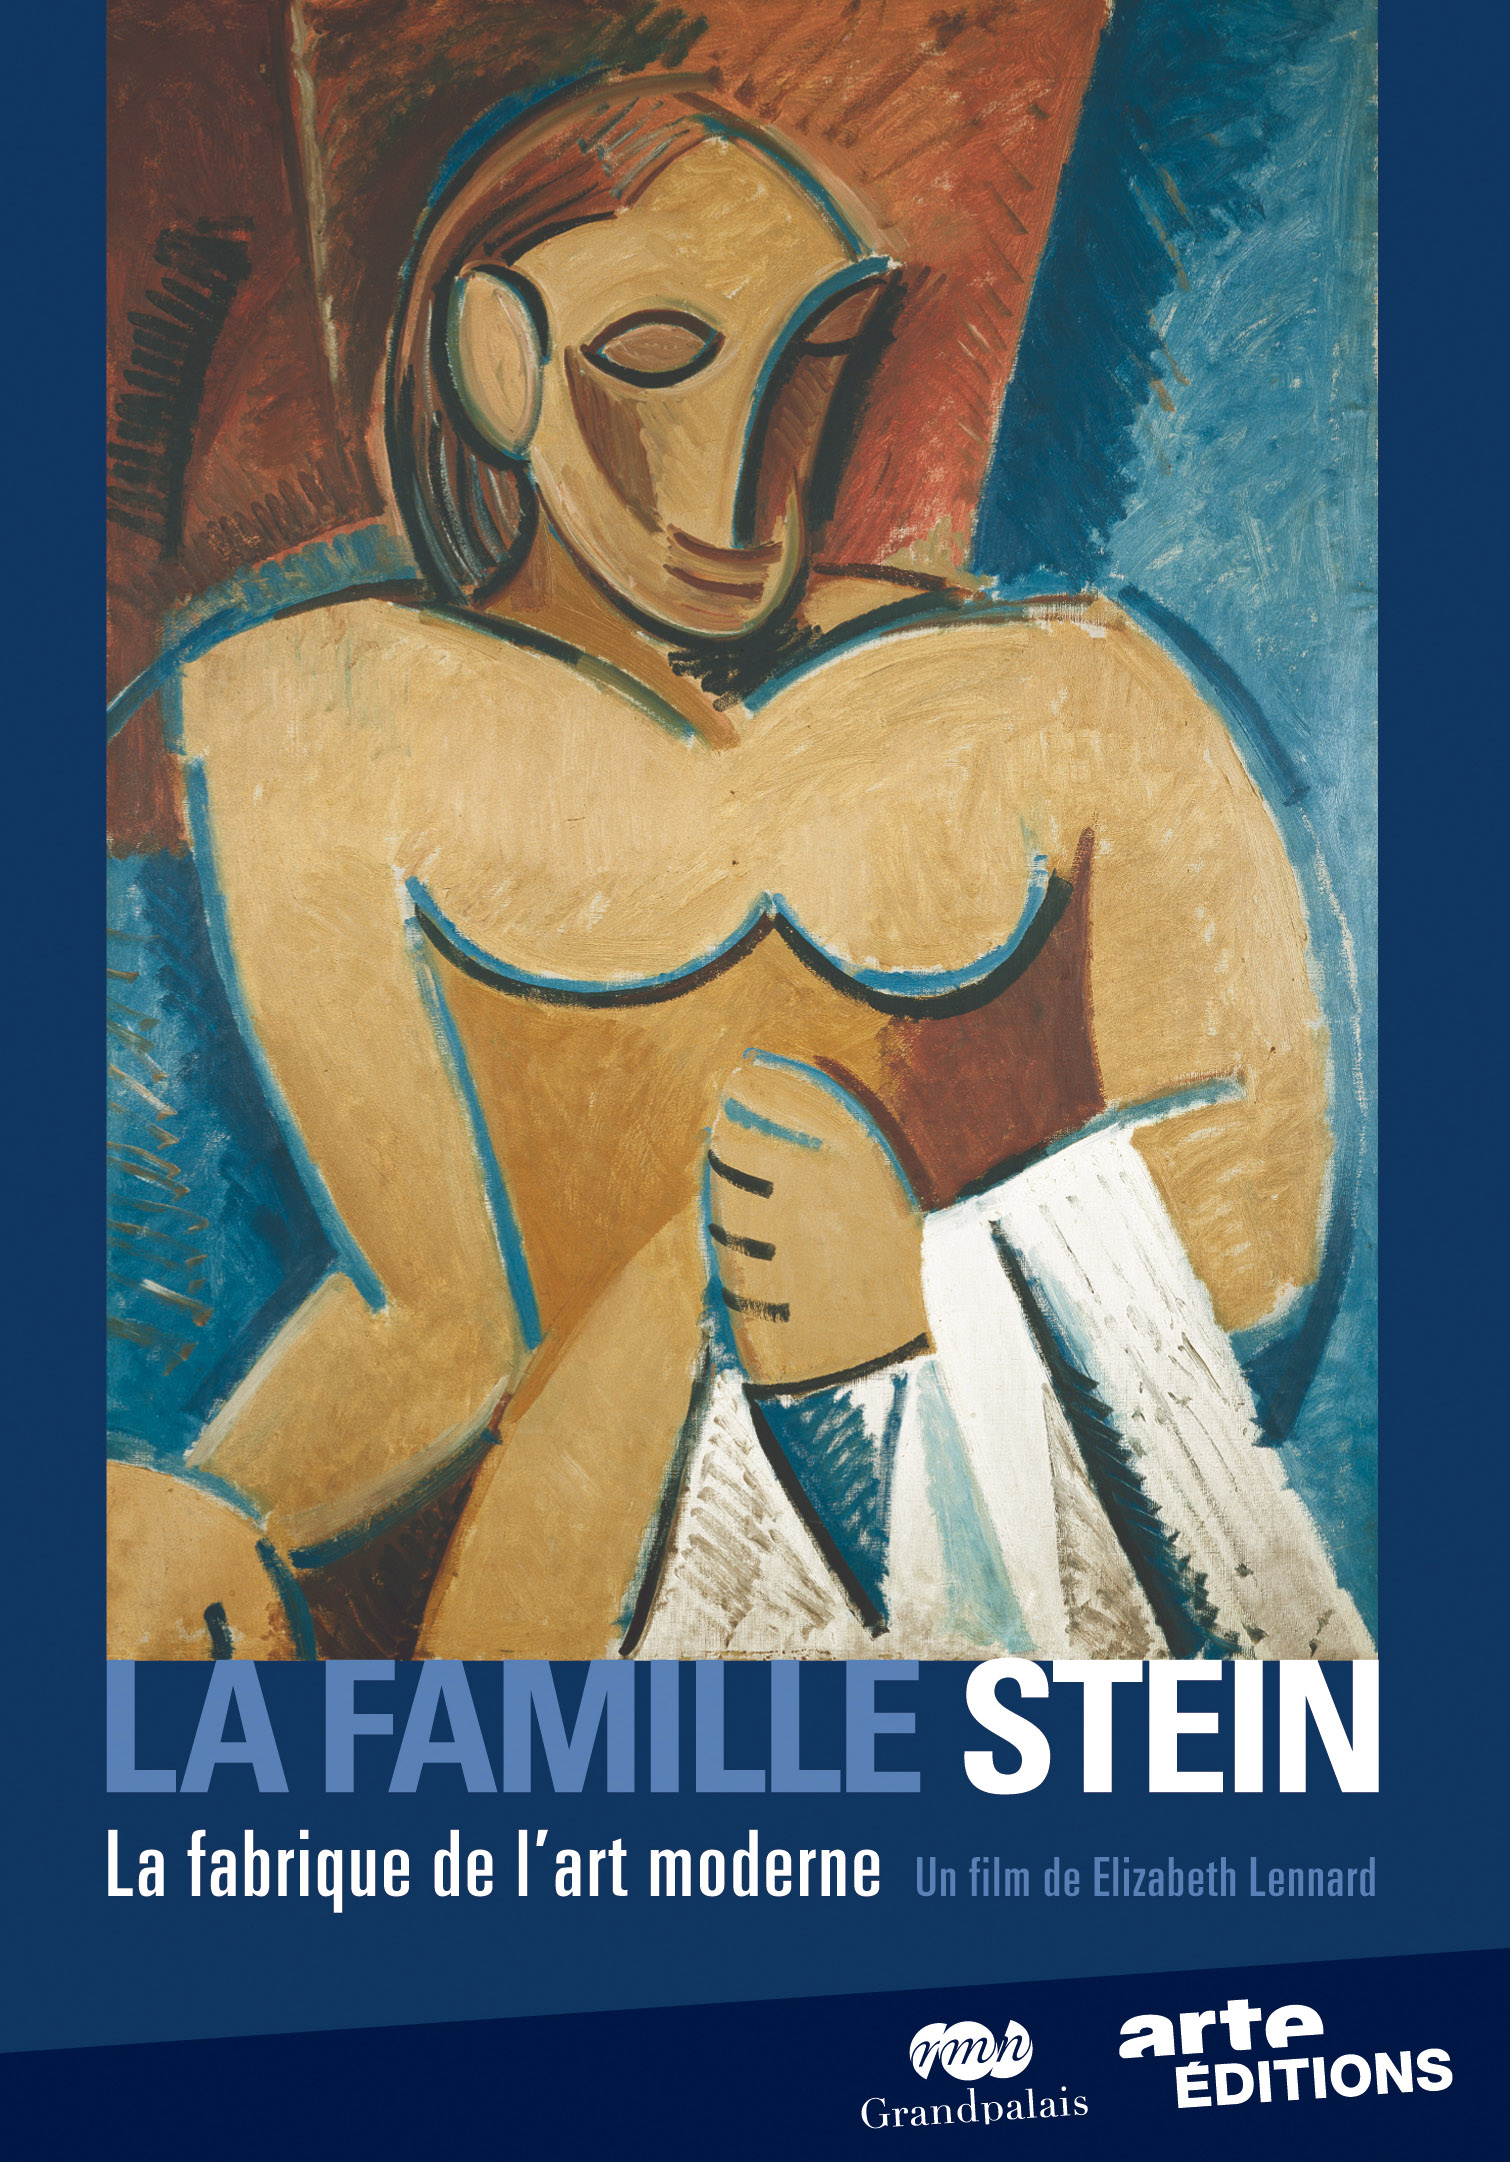 The Stein Family: The Making of Modern Art